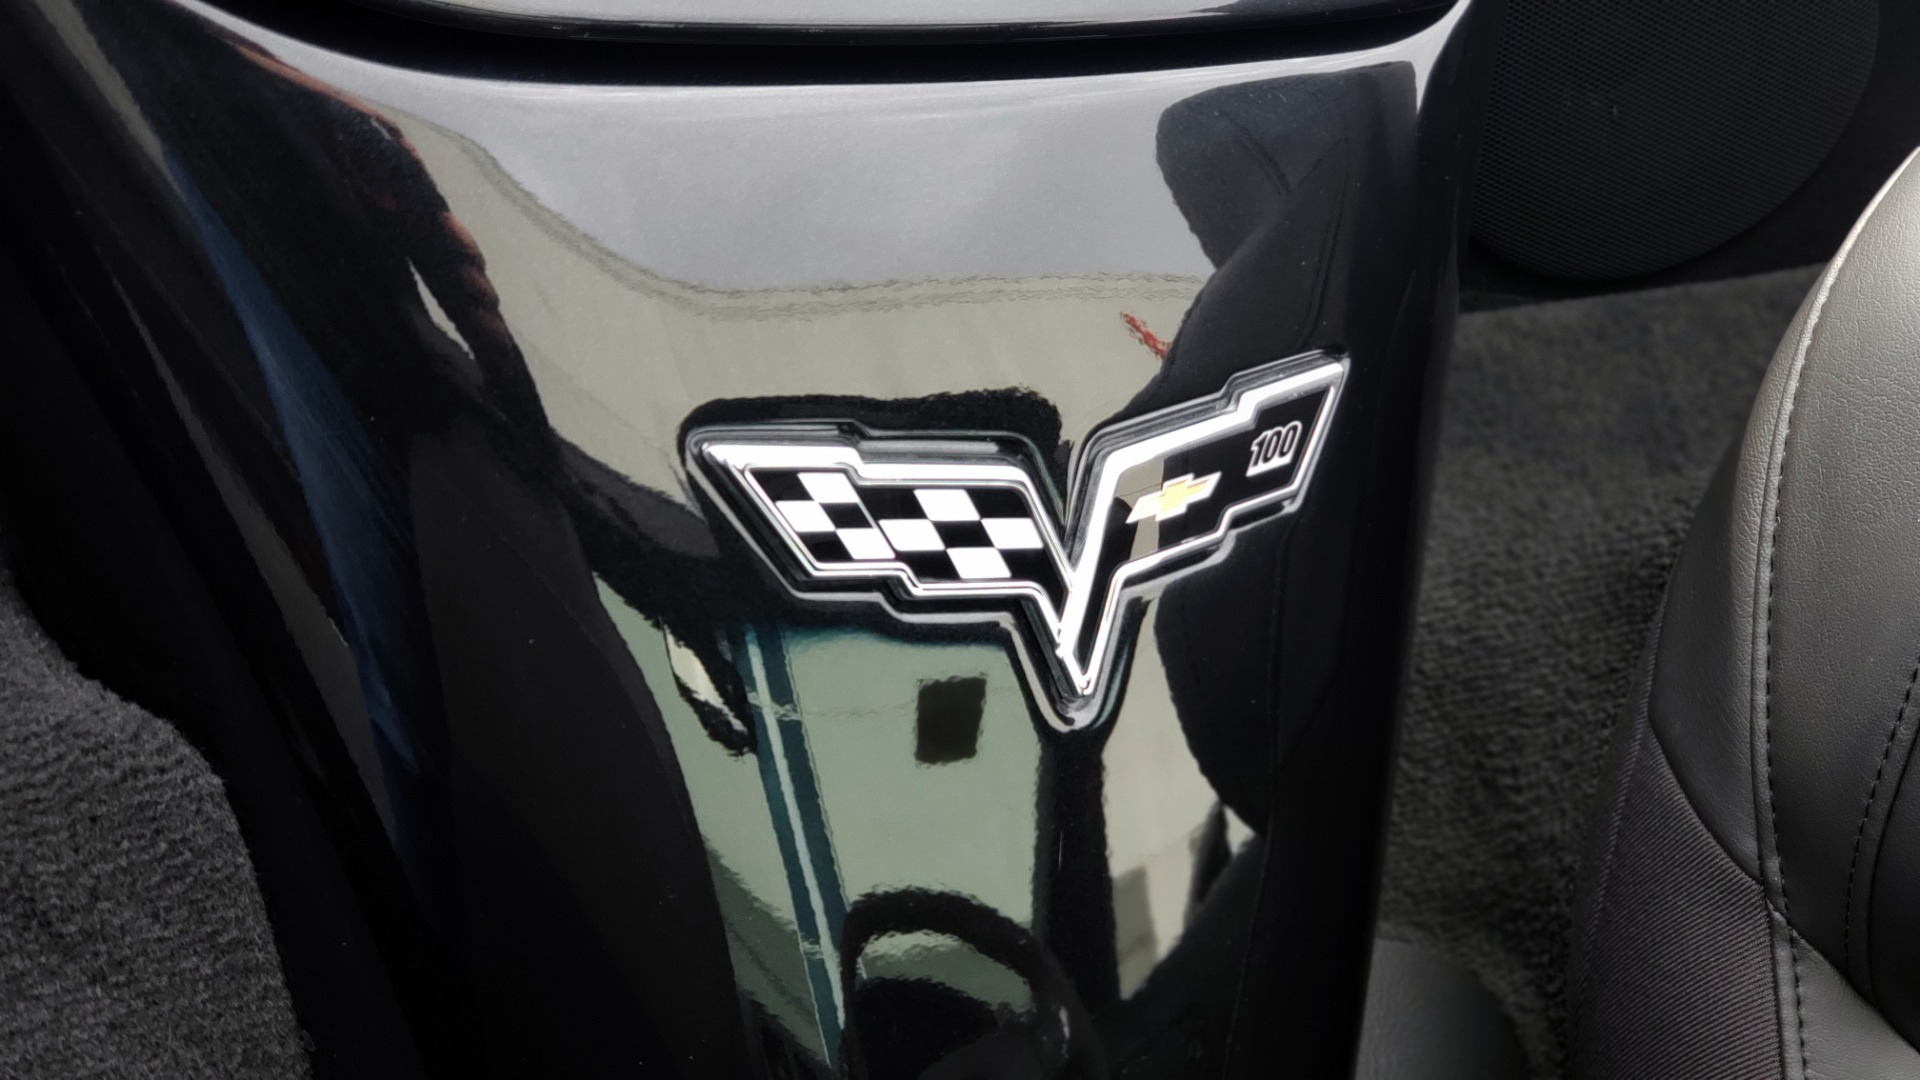 Used 2012 Chevrolet CORVETTE Z16 GRAND SPORT 3LT CONVERTIBLE / 6-SPD AUTO / NAV for sale $38,990 at Formula Imports in Charlotte NC 28227 66